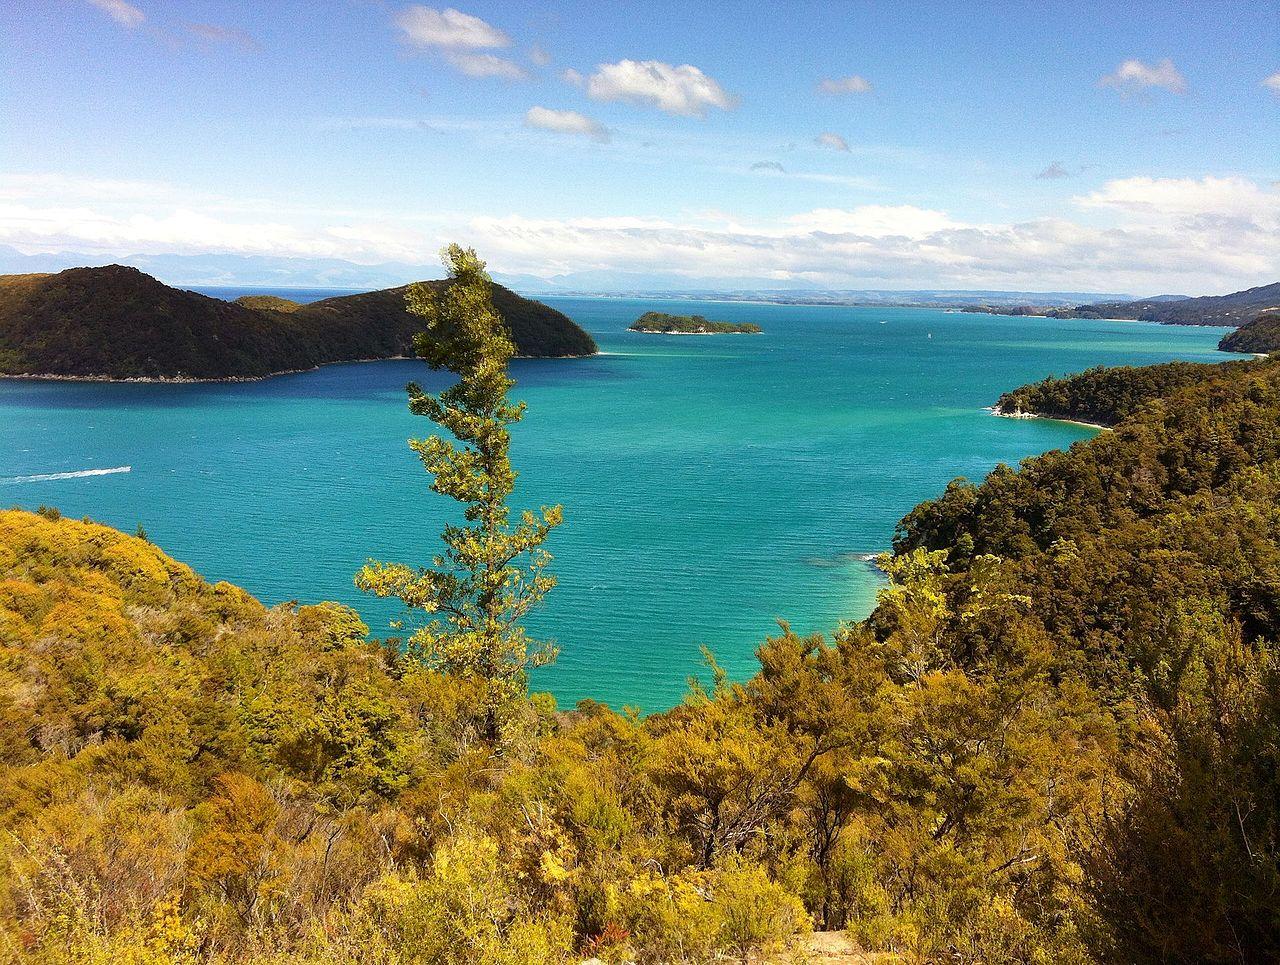 New Zealand: North Island Vs South Island